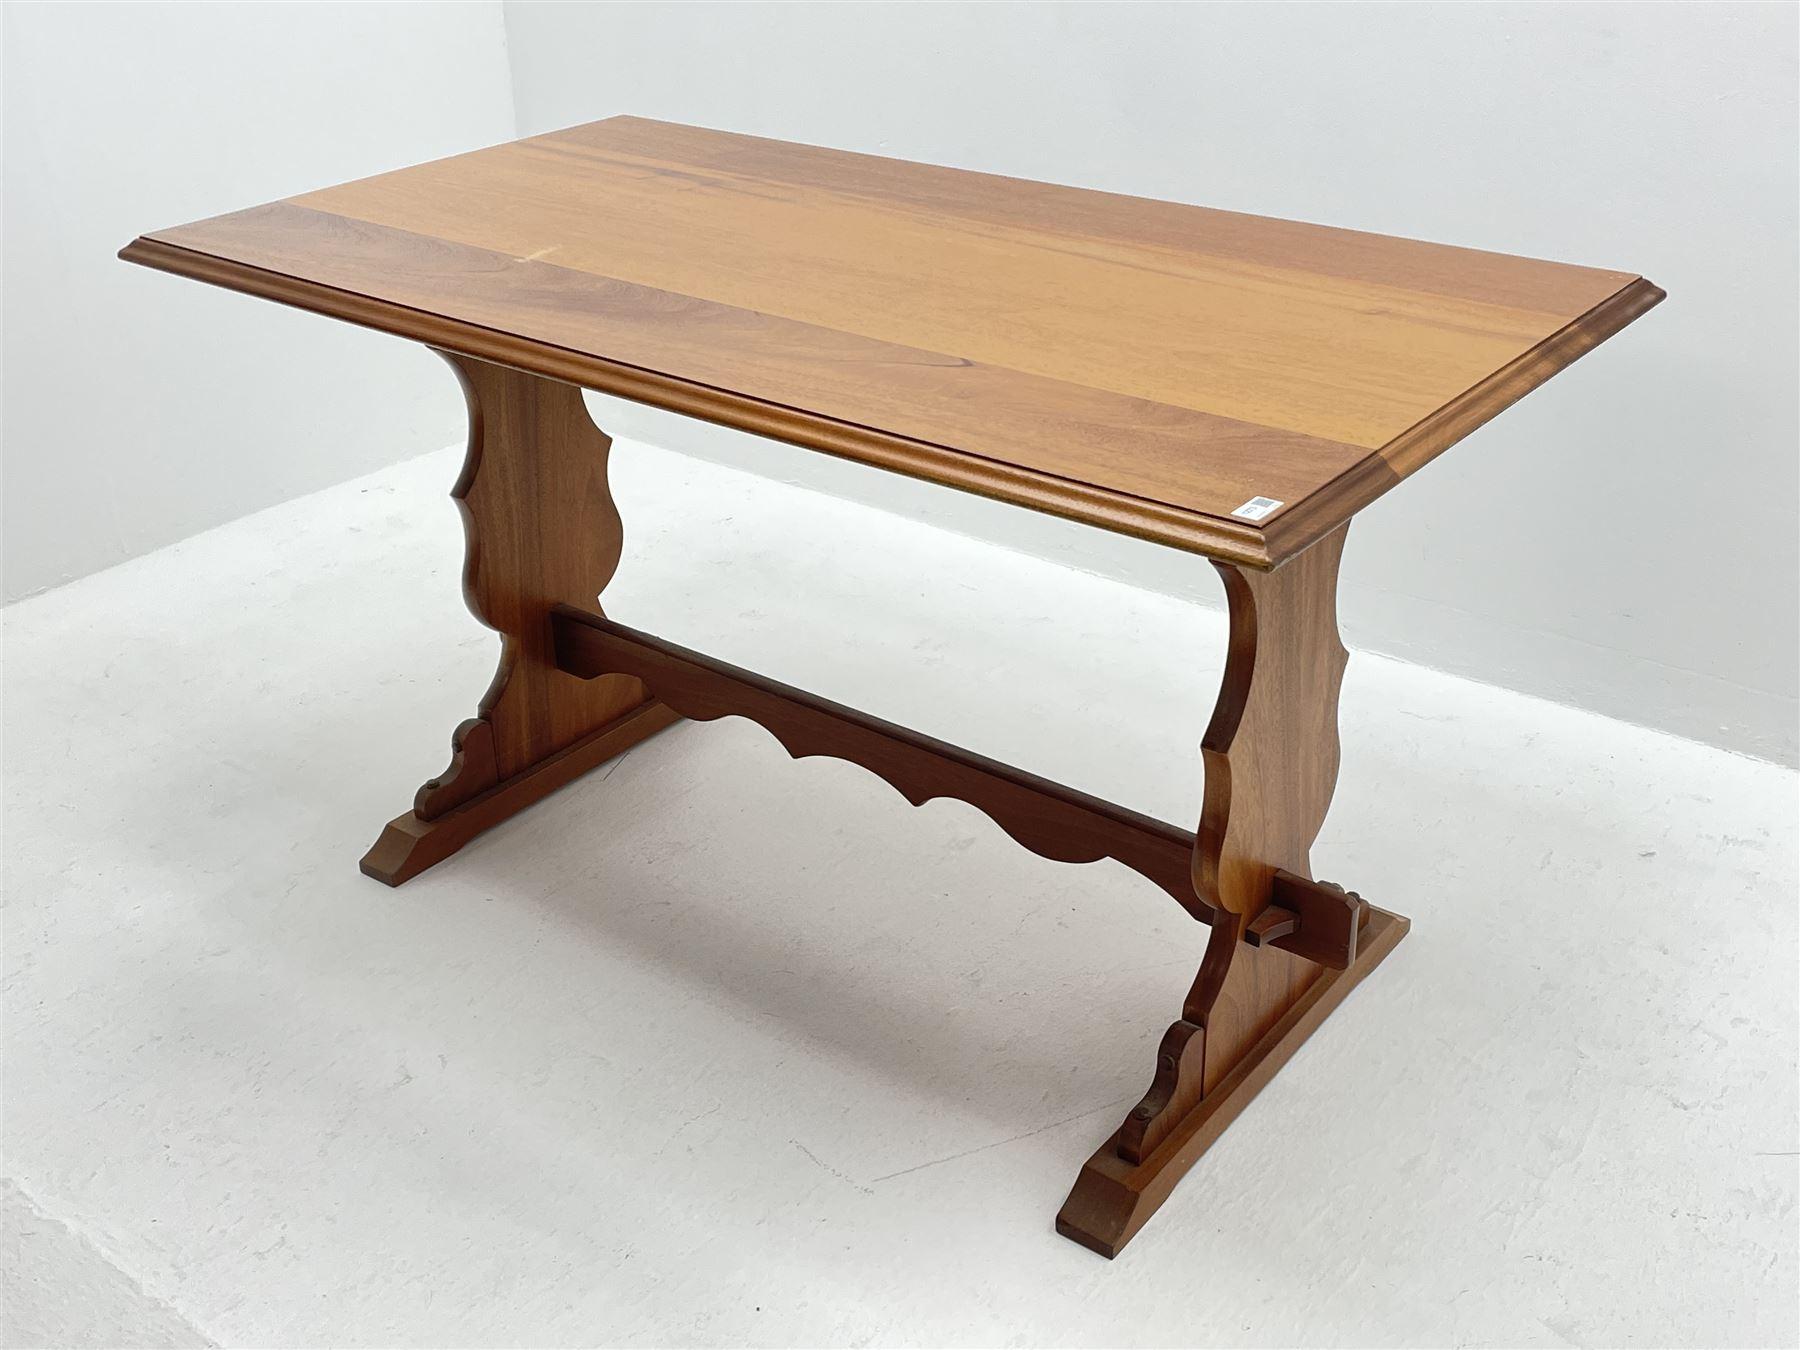 Late 20th century teak table - Image 2 of 3